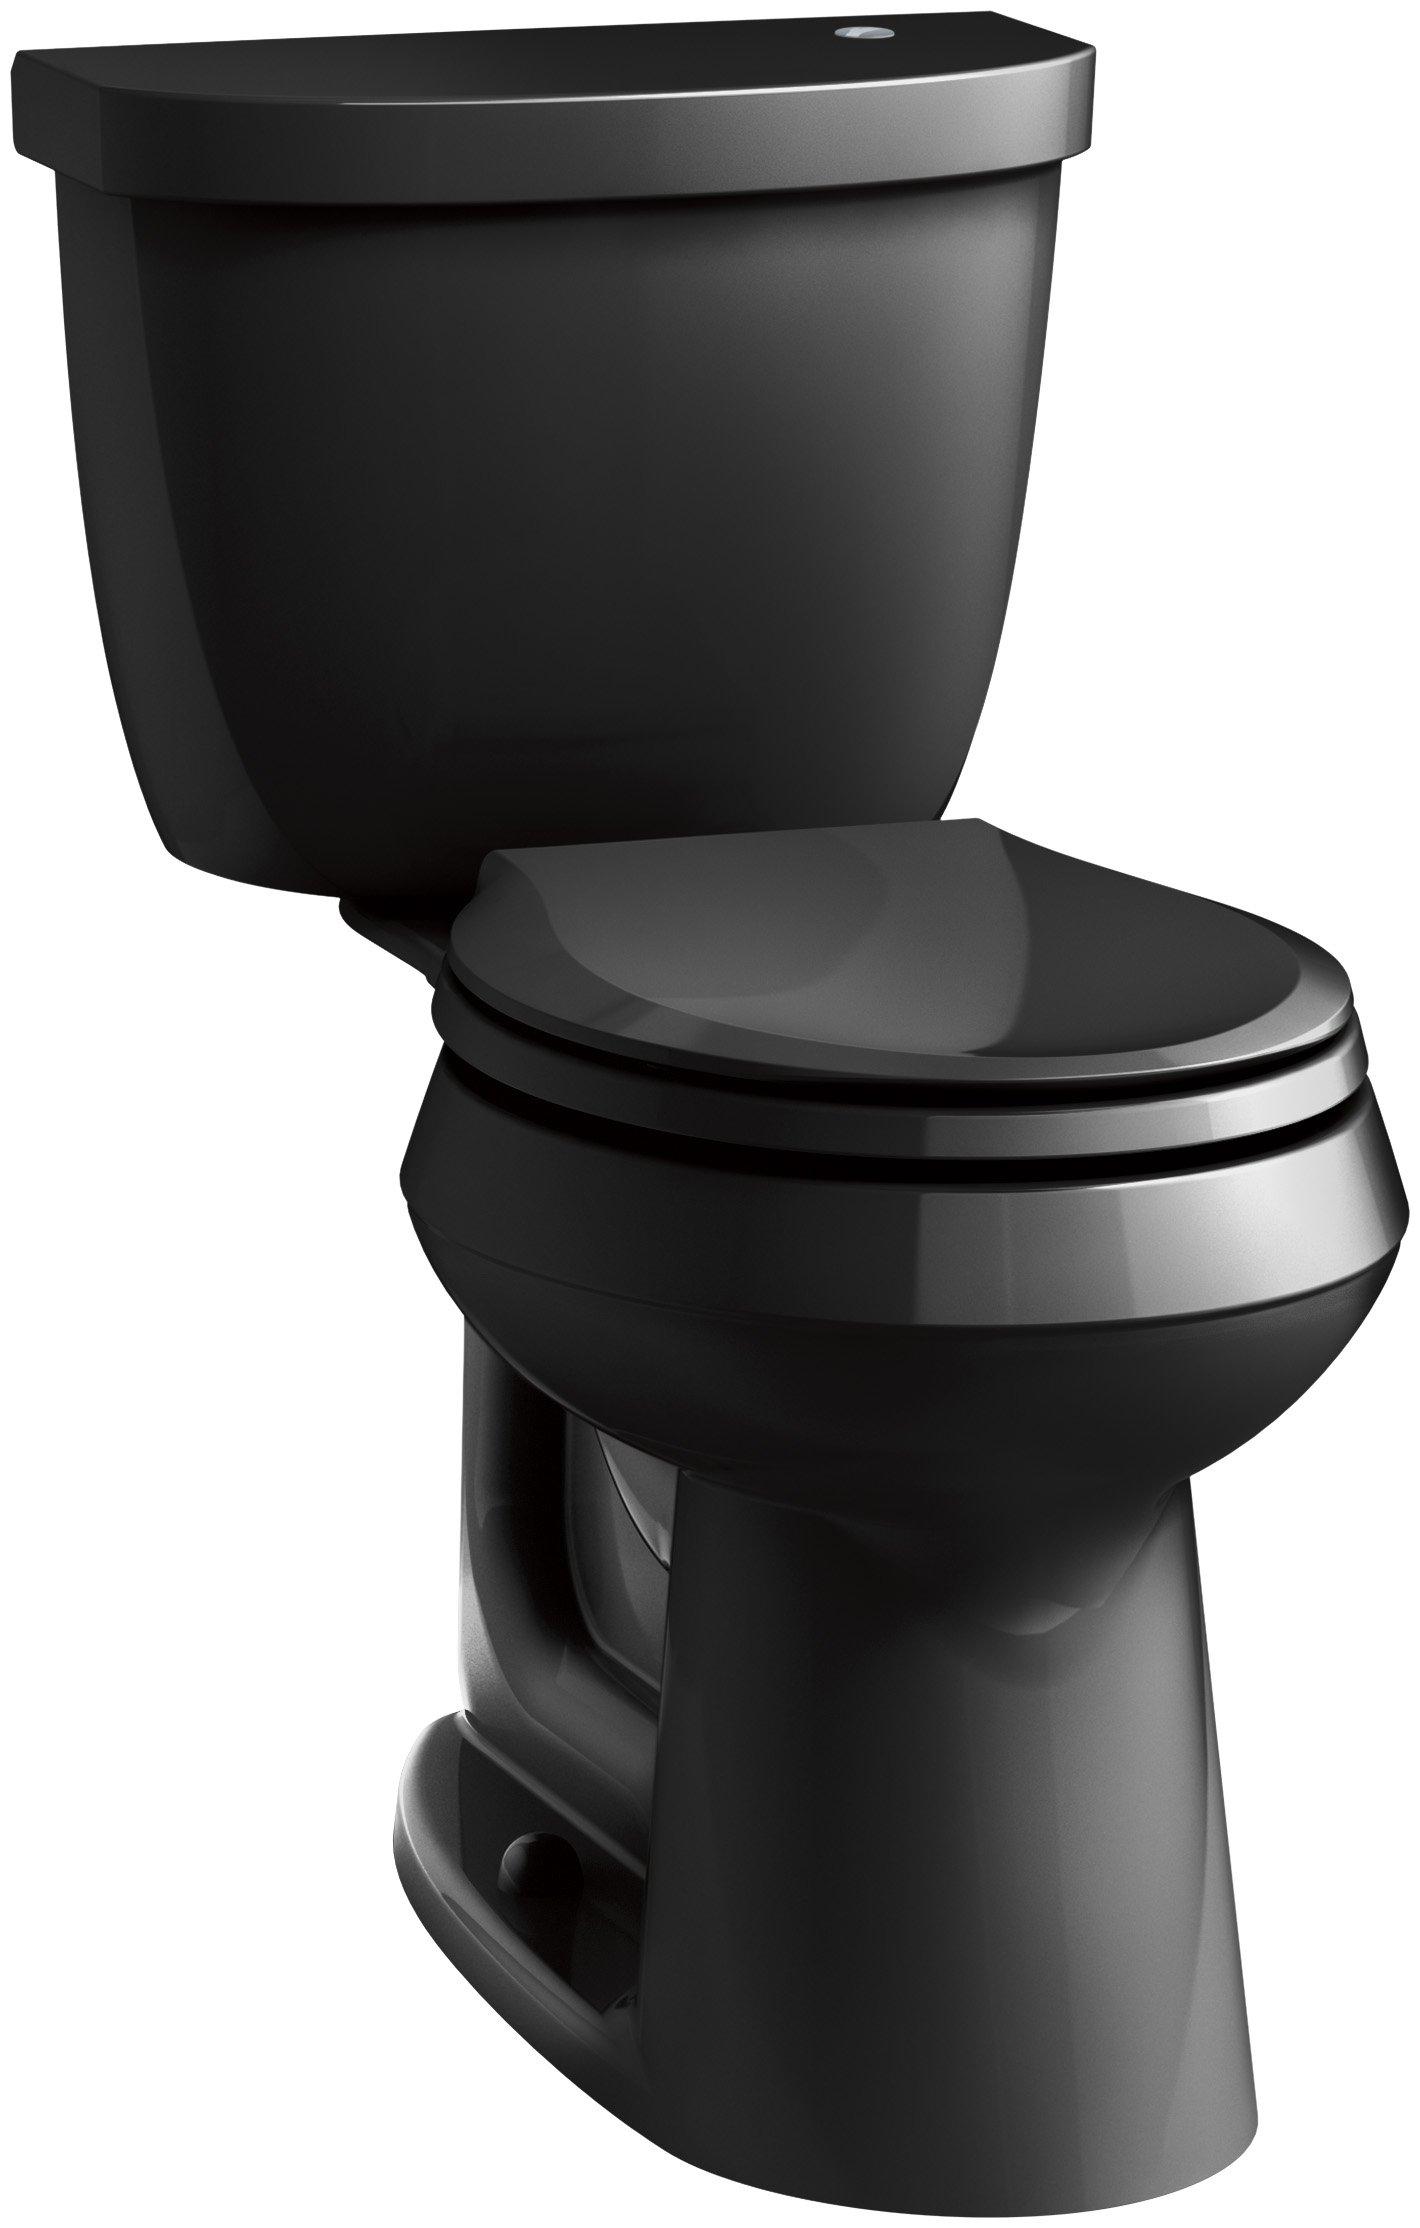 KOHLER K-6419-7 Cimarron Touchless Comfort Height 1.28 GPF Round Toilet with Aqua Piston Flushing Technology, Black, 2-Piece by Kohler